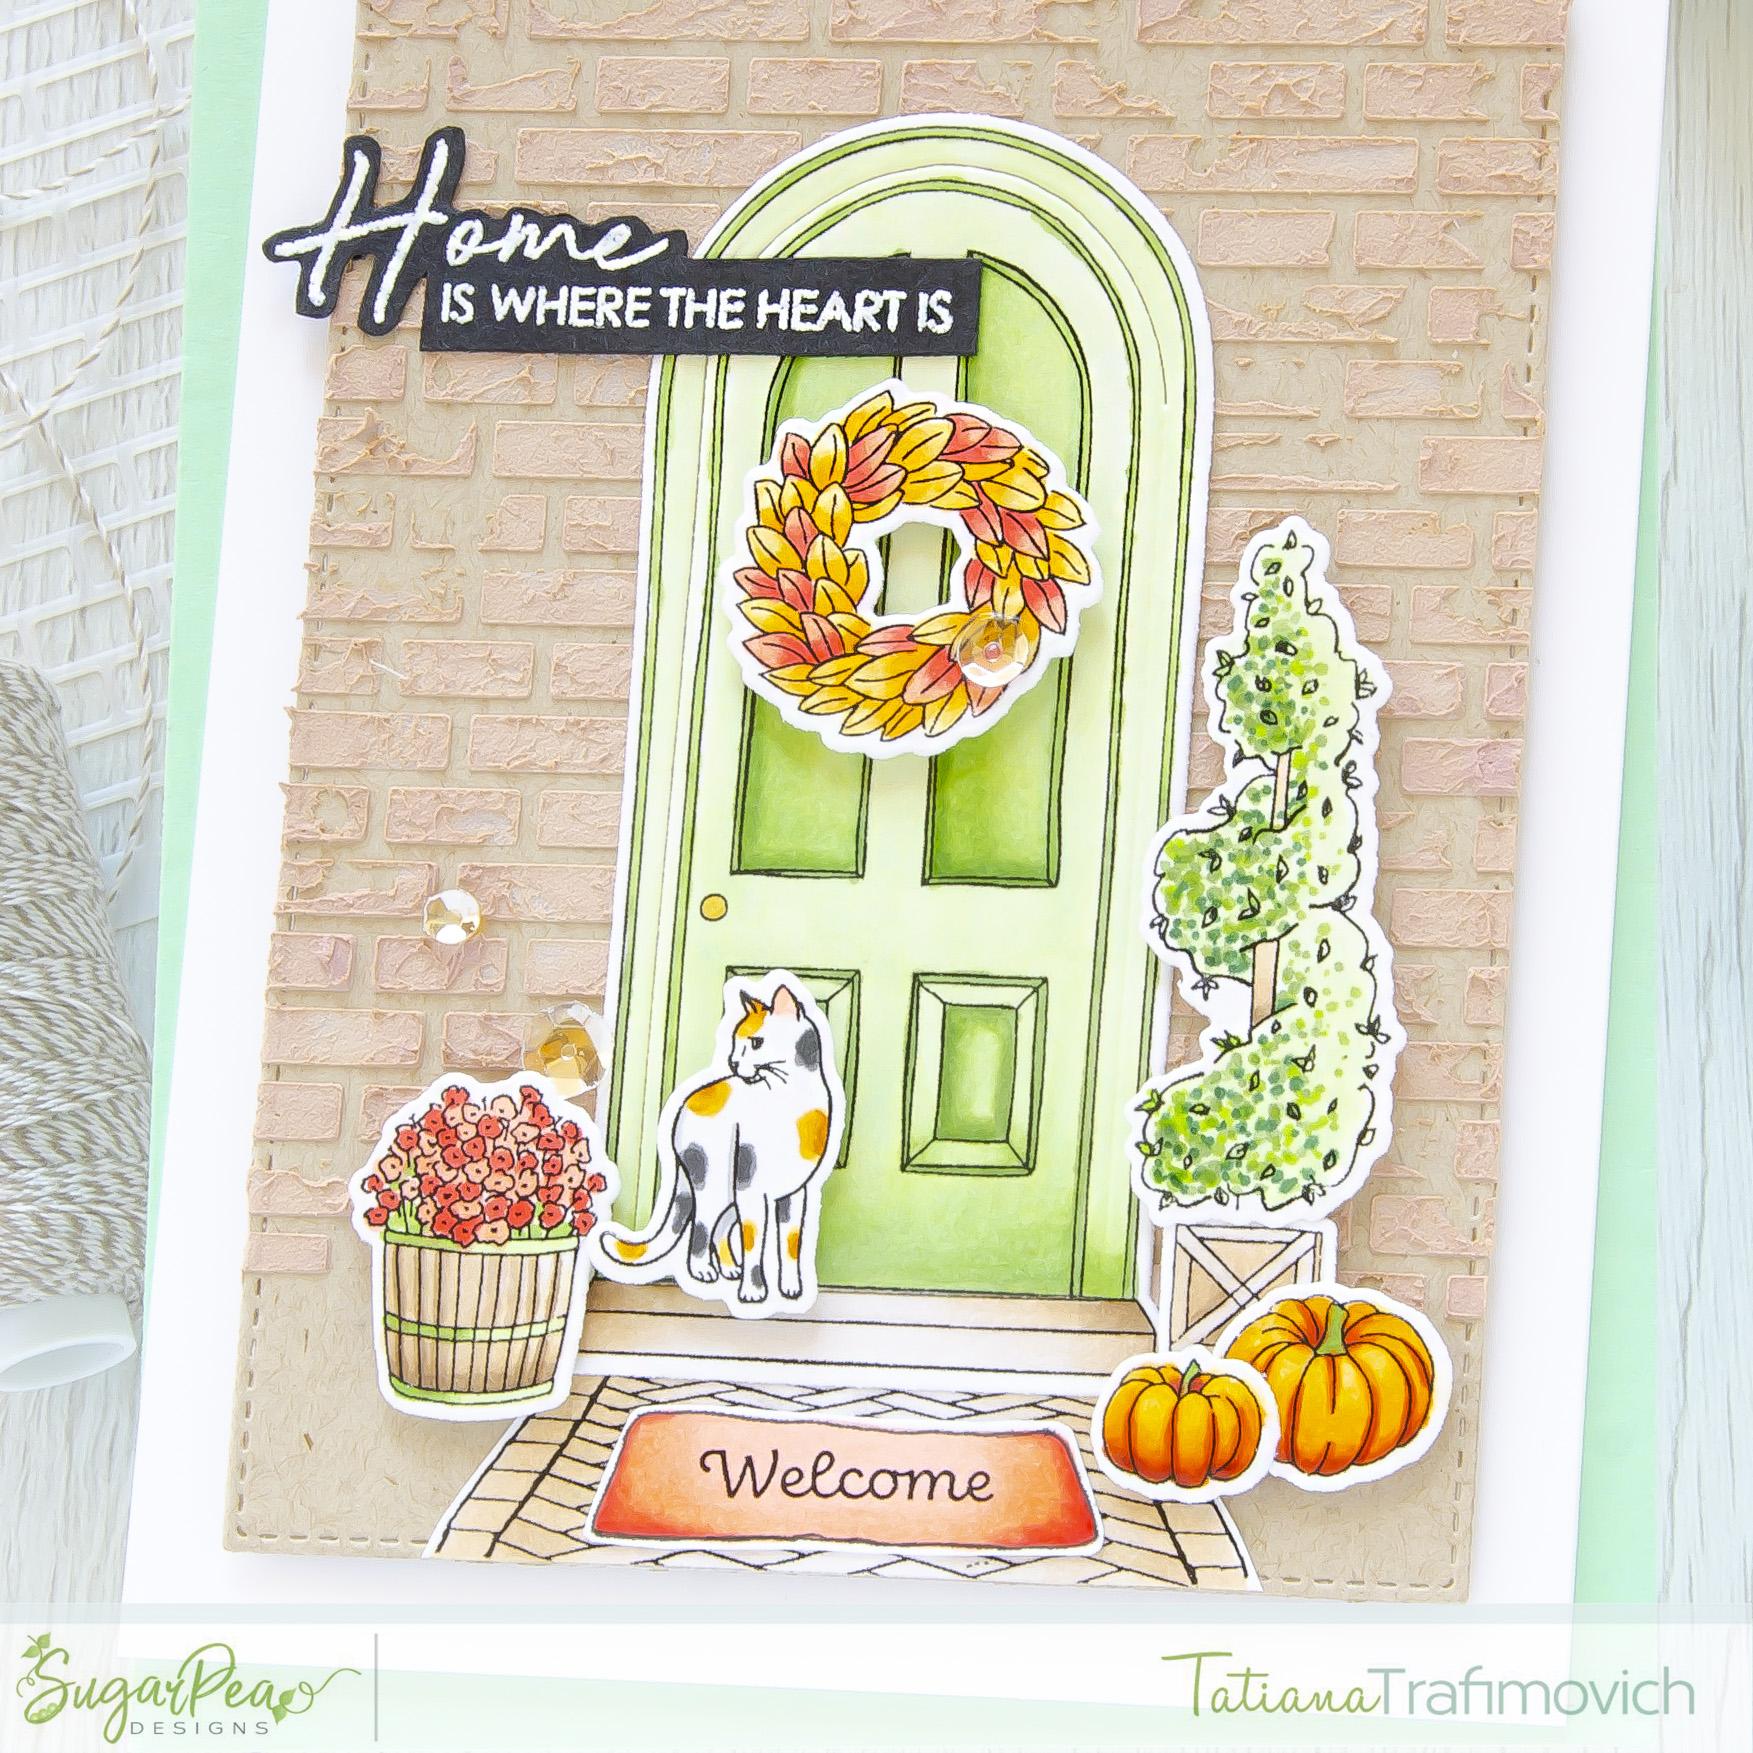 Home Is Where The Heart Is #handmade card by Tatiana Trafimovich #tatianacraftandart - Always Welcome stamp set by SugarPea Designs #sugarpeadesigns